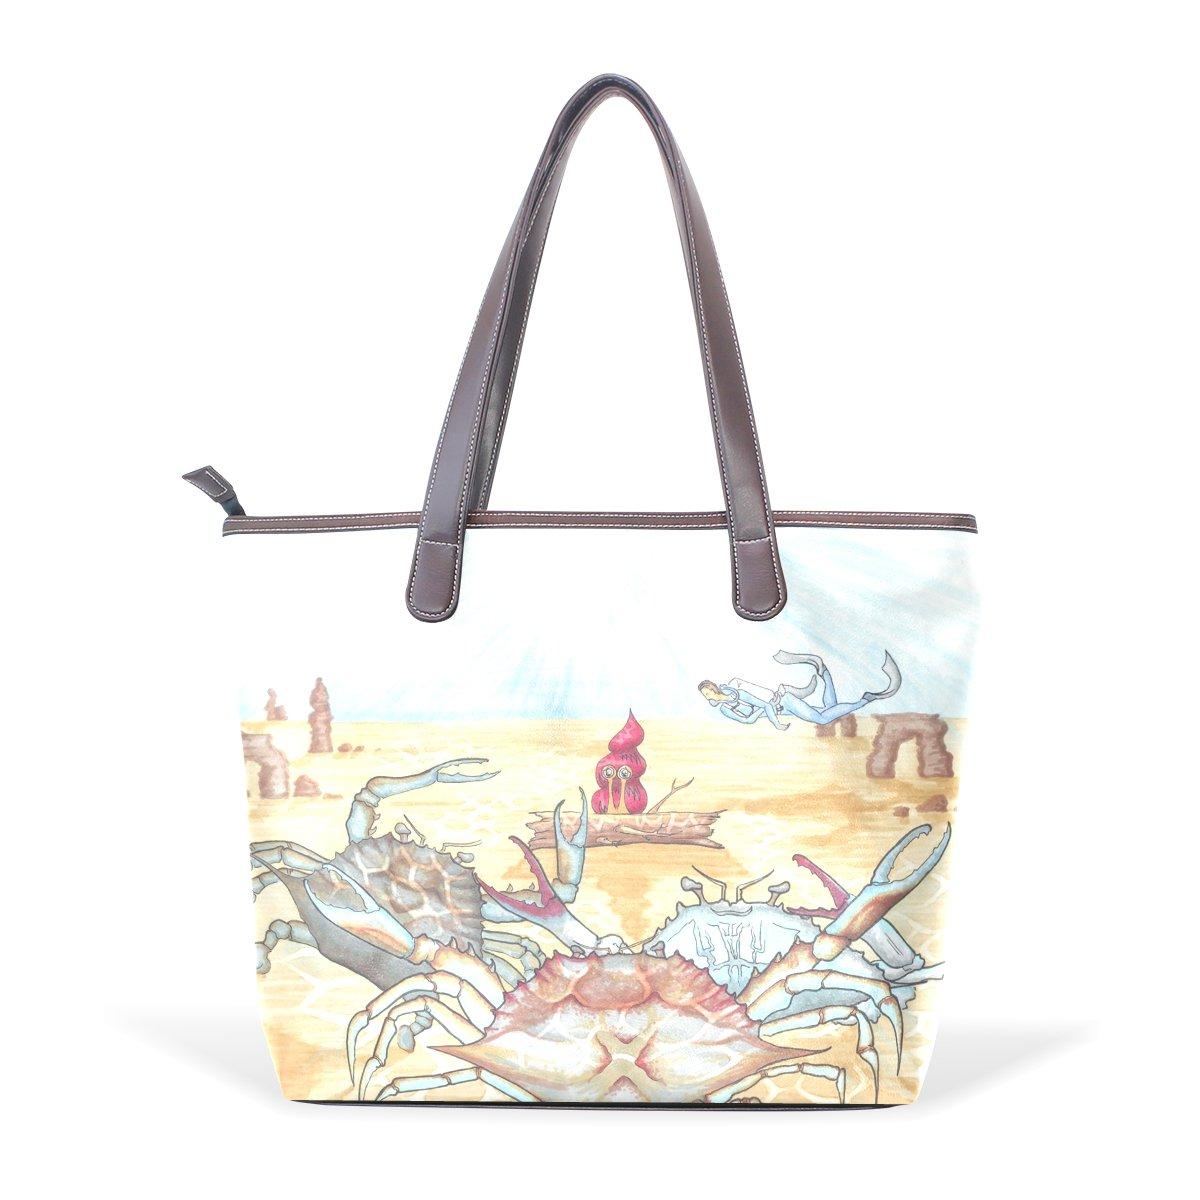 Ye Store Watercolor Crab Lady PU Leather Handbag Tote Bag Shoulder Bag Shopping Bag